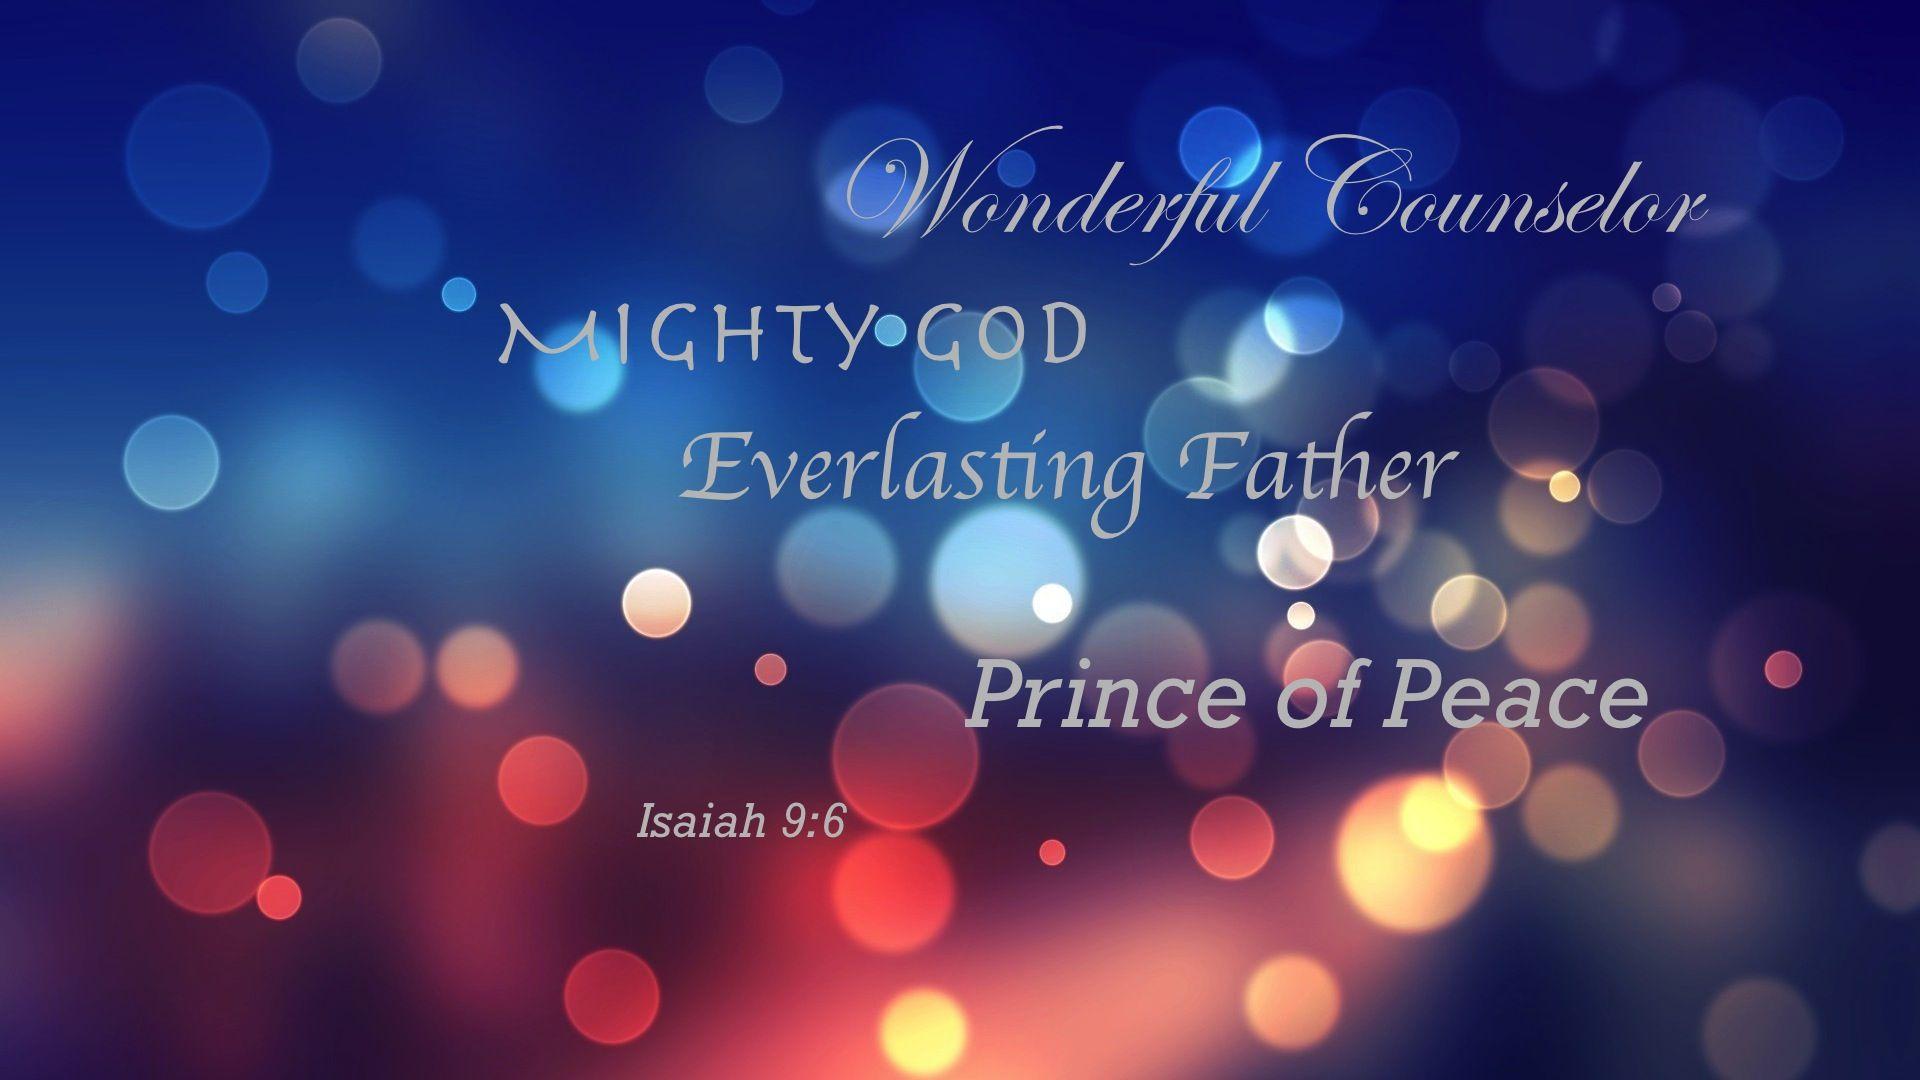 Facebook Christmas Banner Wonderful Counselor